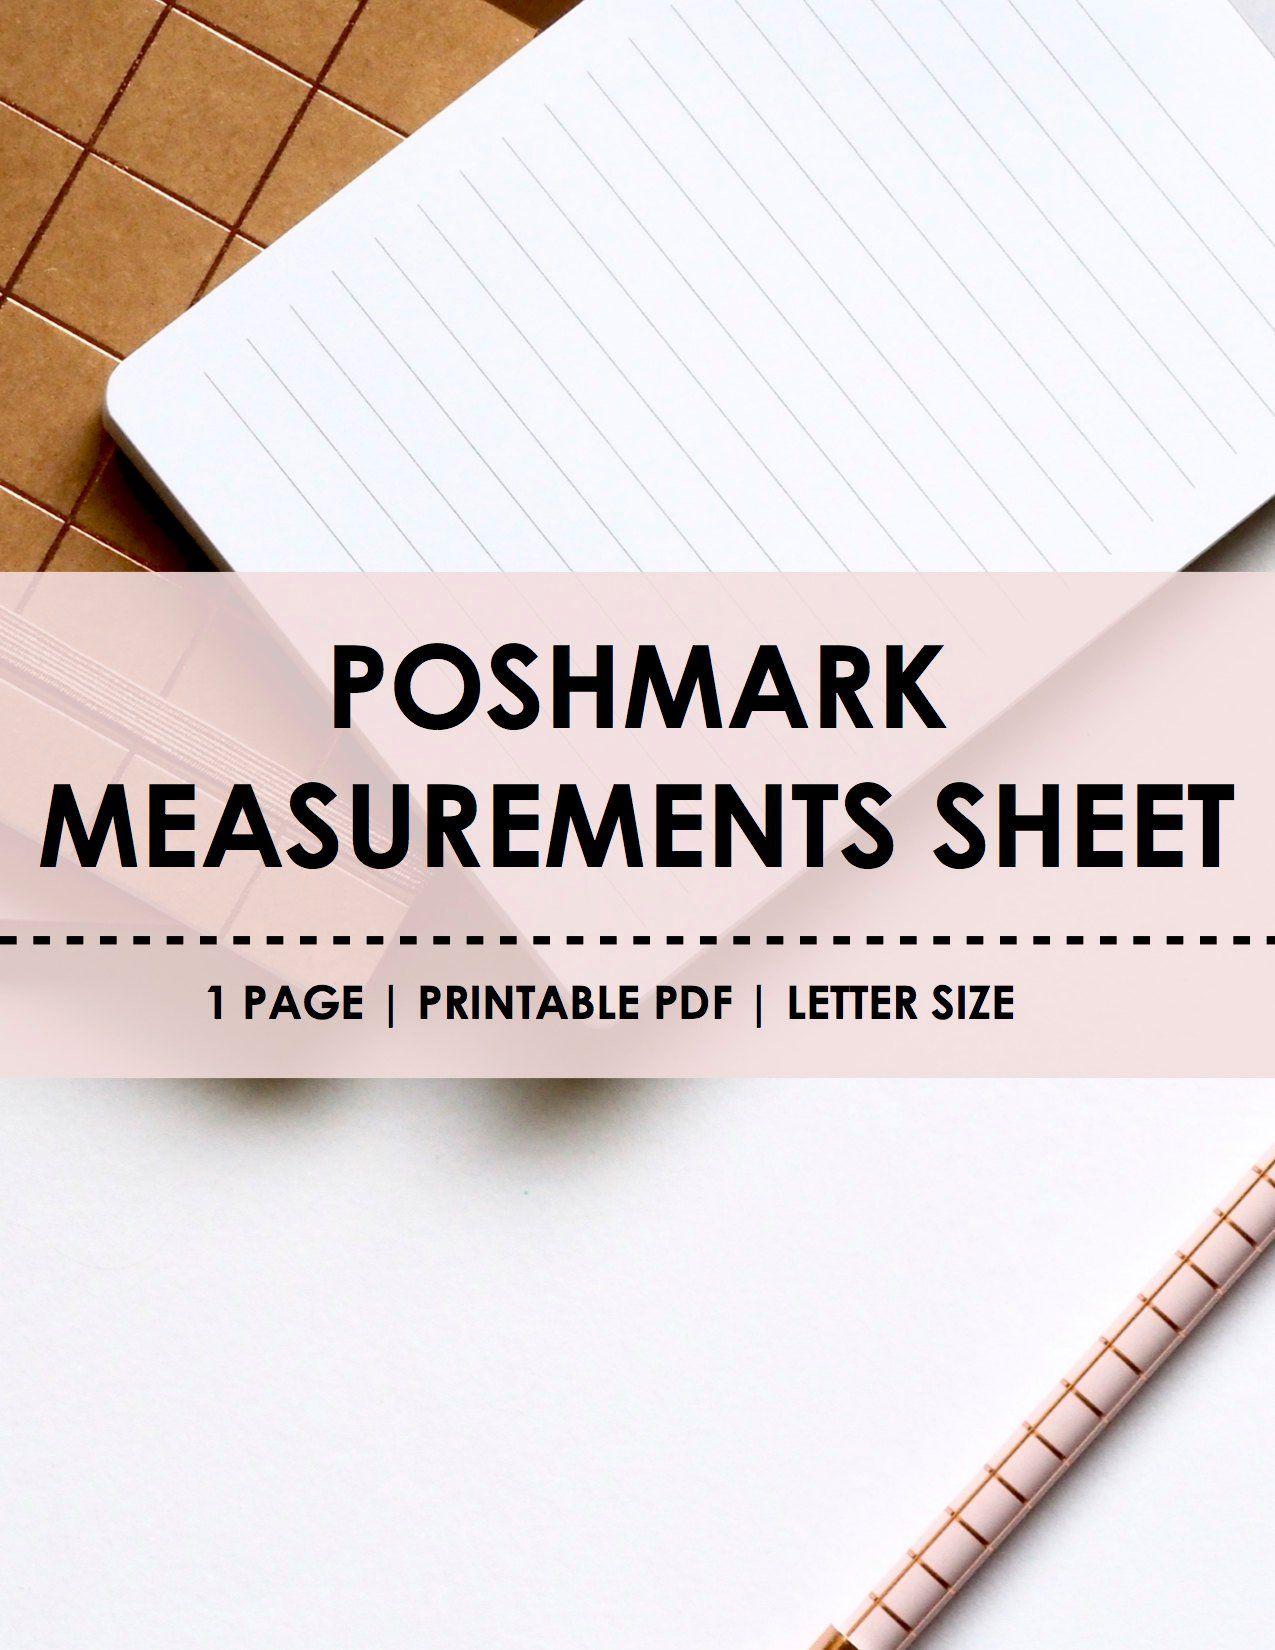 Poshmark Management Kit Measurements Worksheet Poshmark